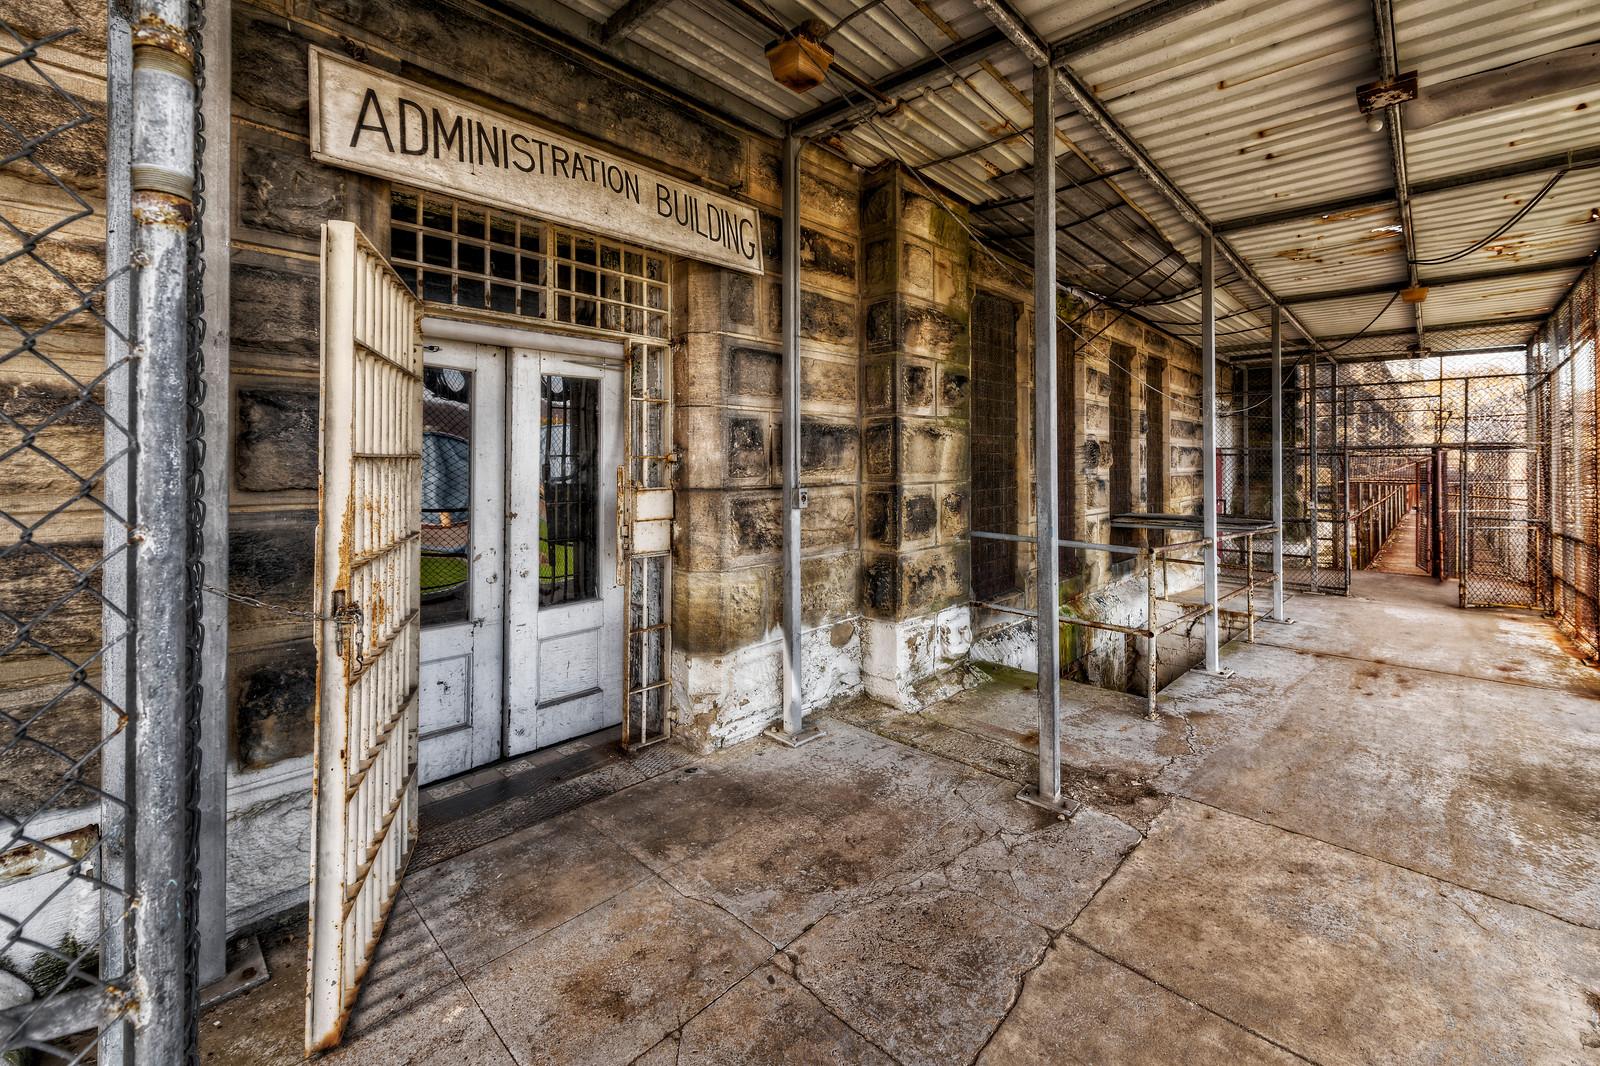 West Virginia Penitentiary Admin Building